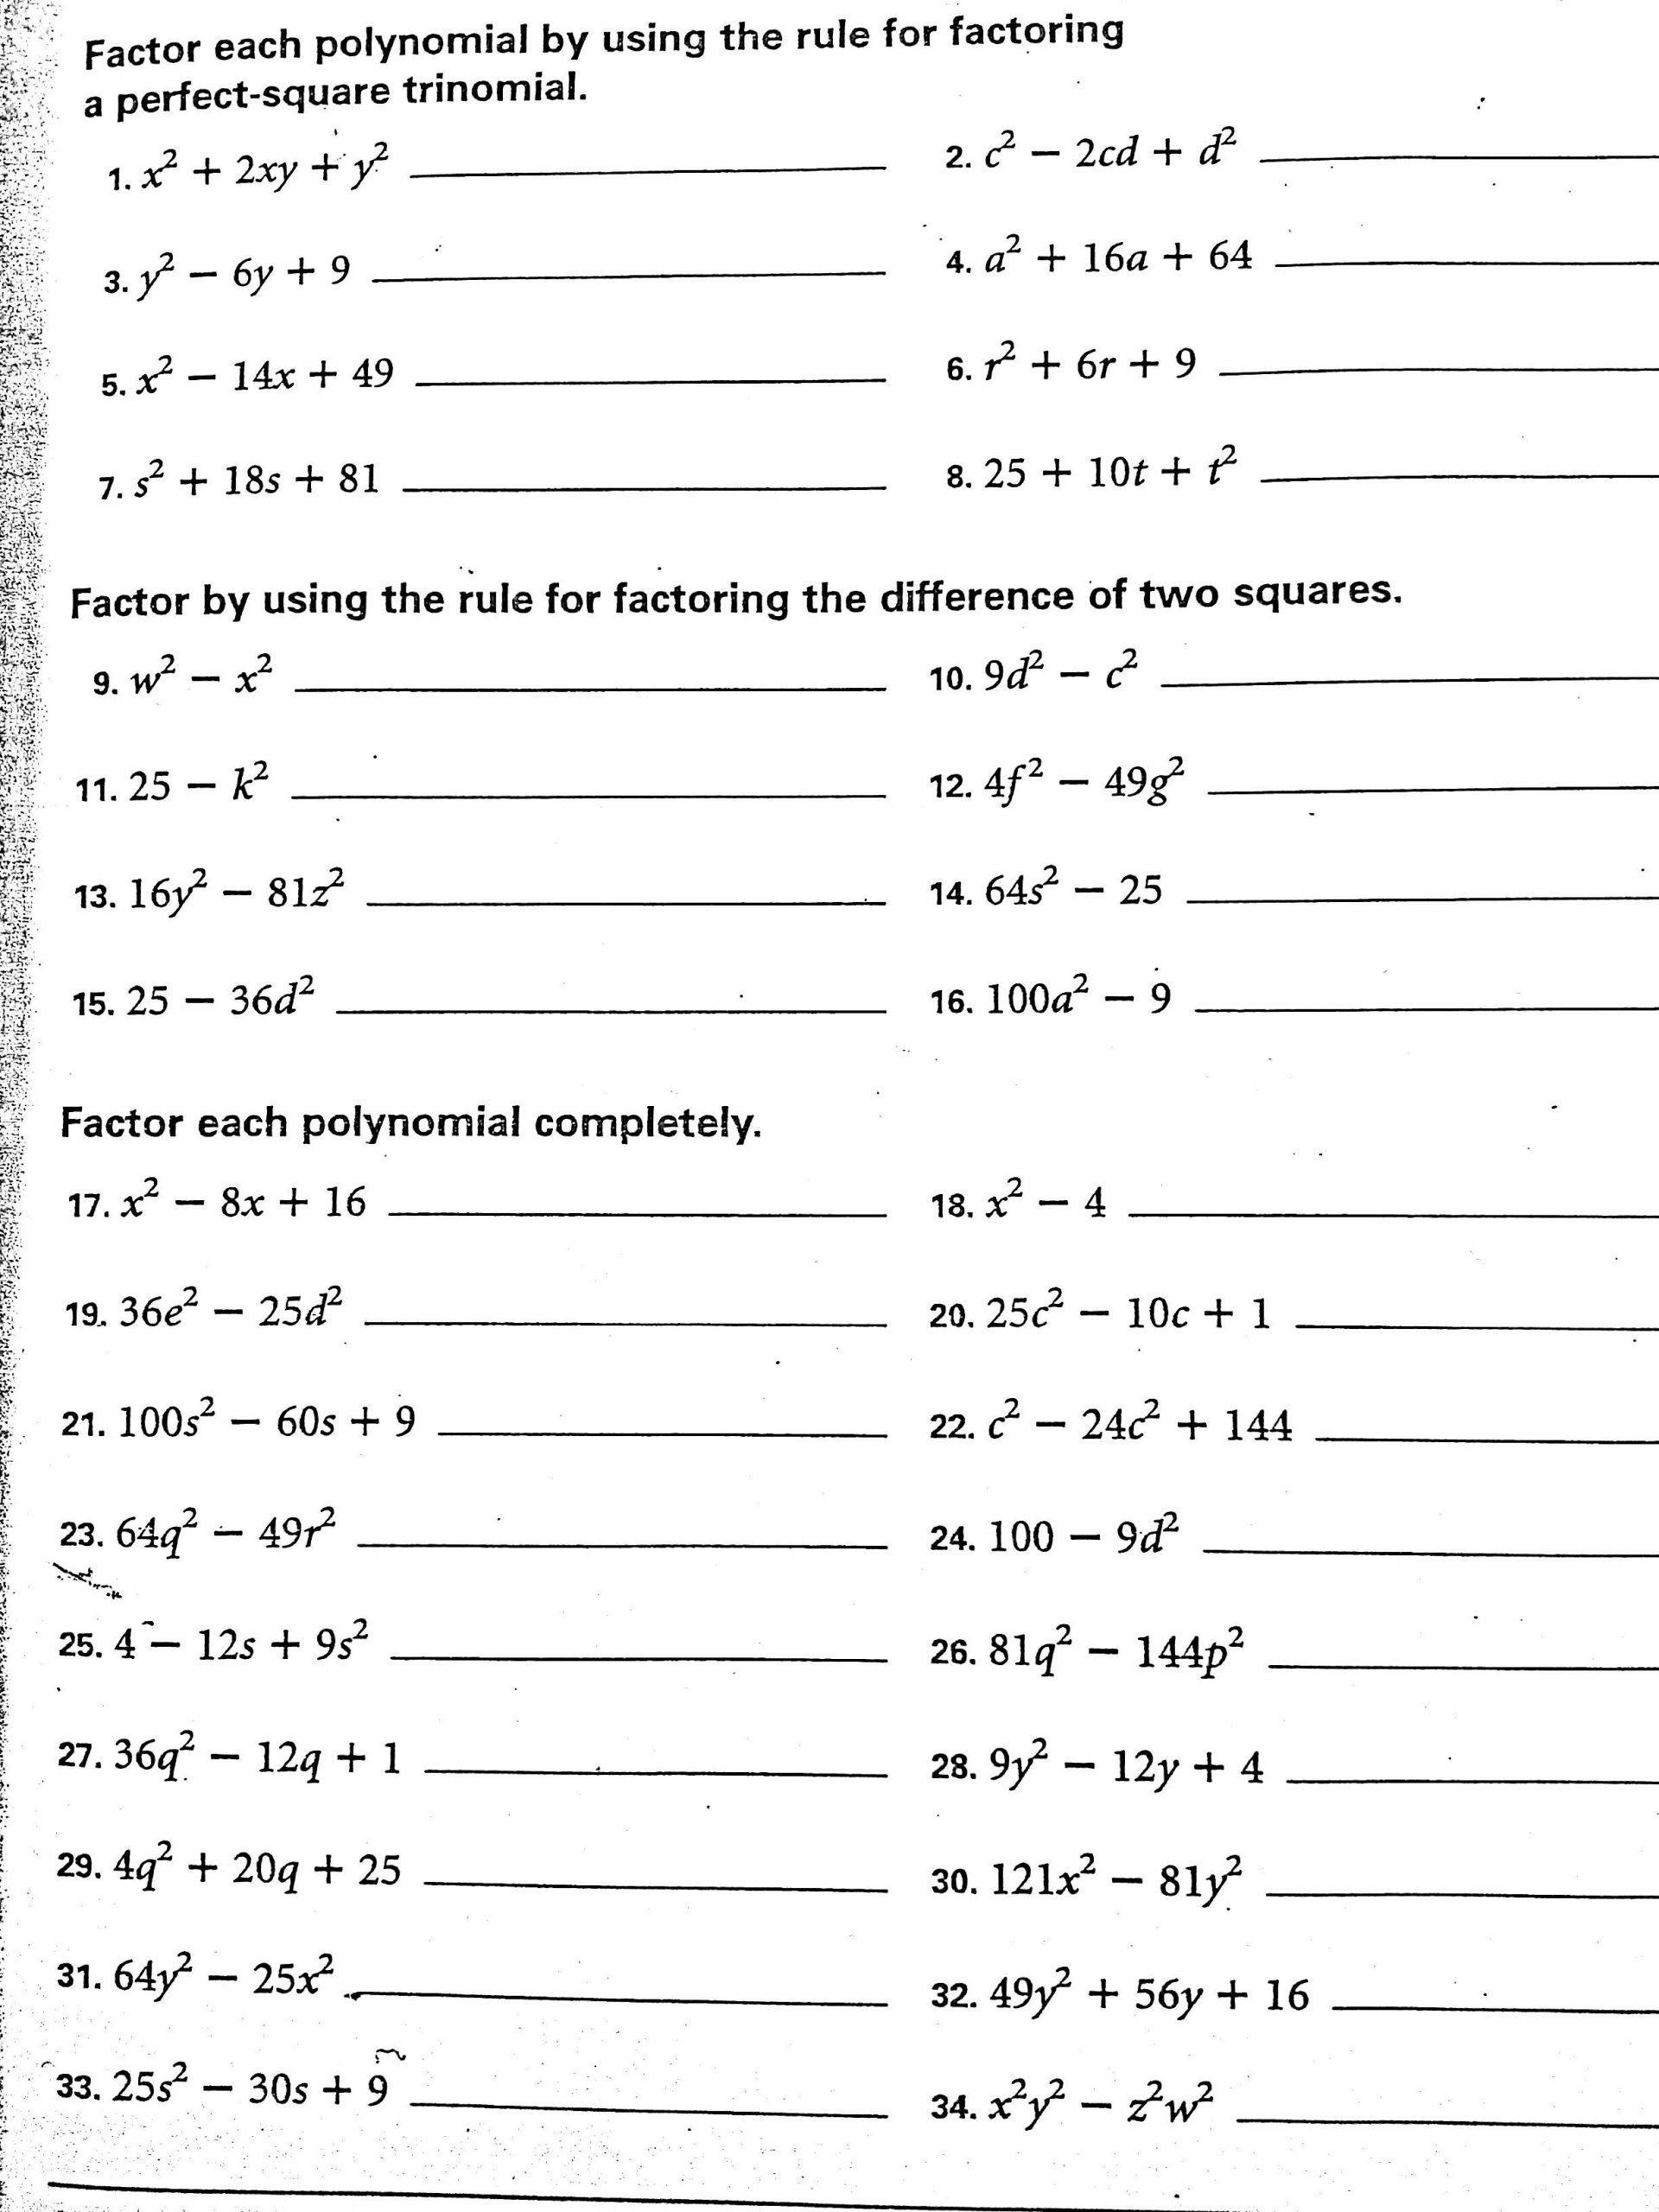 Algebra 1 Factoring Worksheet Difference Two Squares Homework Clipart 50 Amazing In 2020 Algebra 1 Algebra Worksheet Template